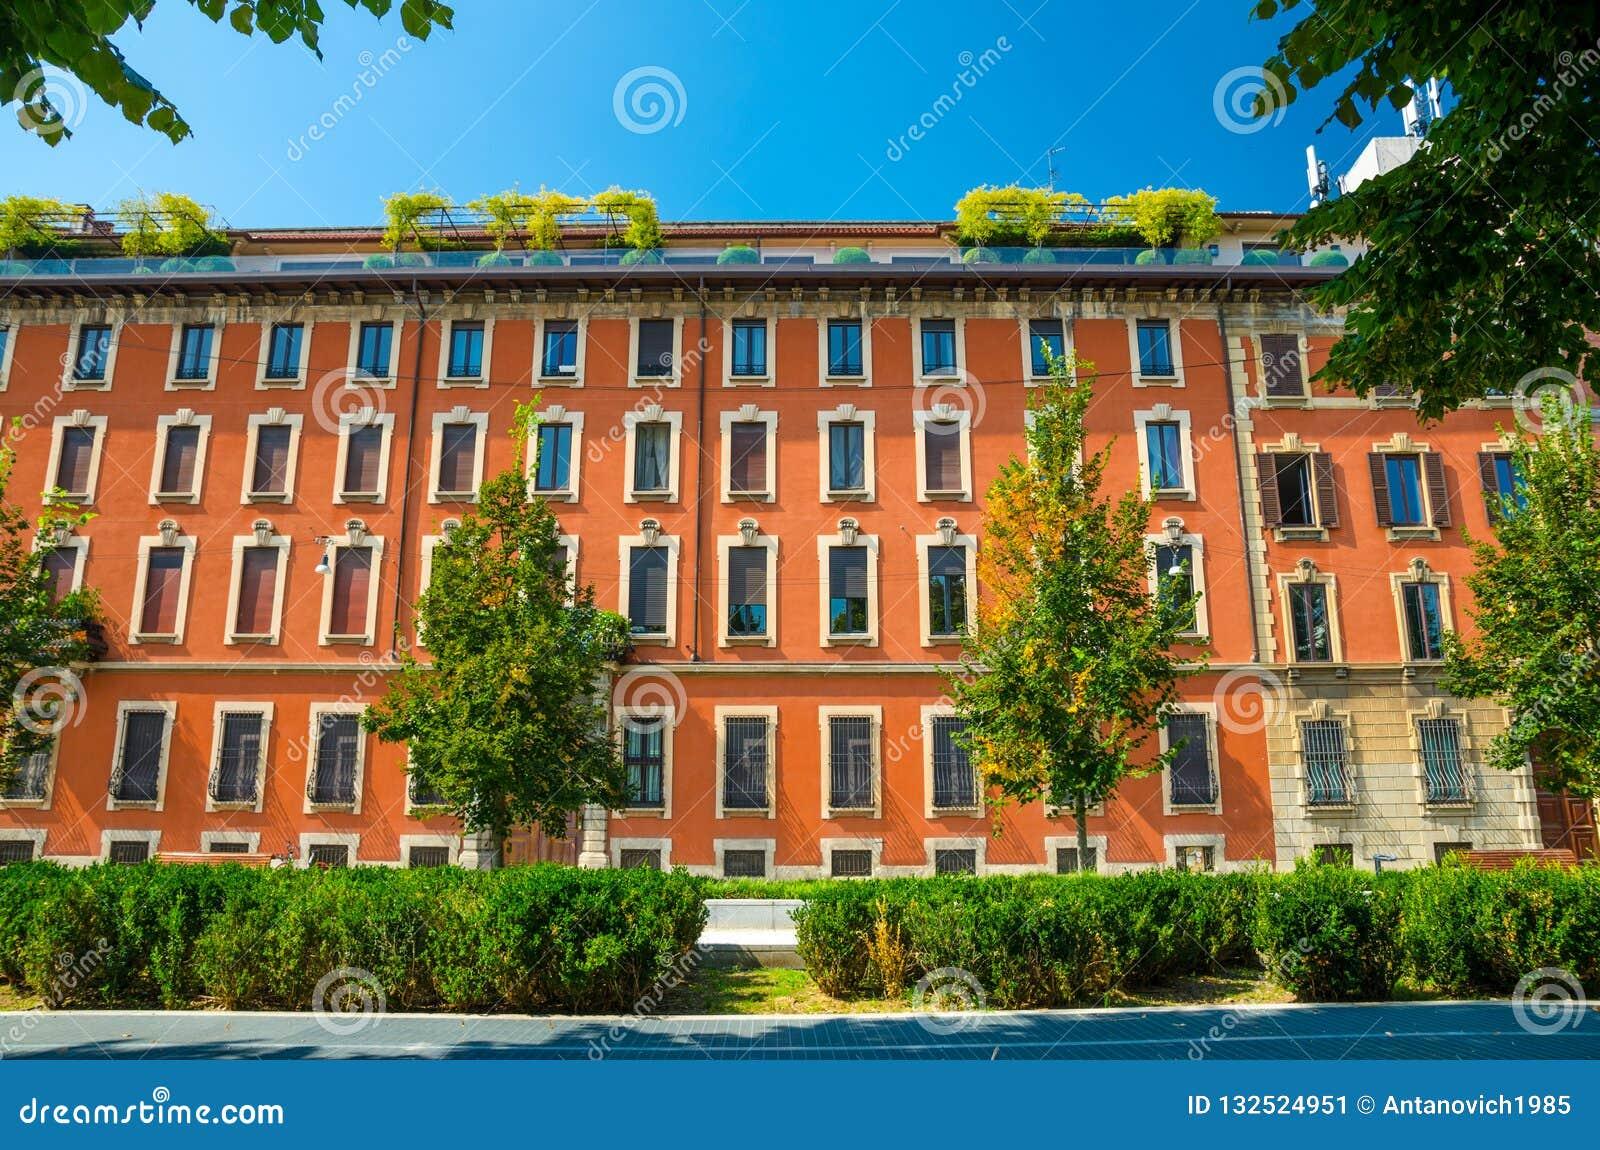 Orange Multi Storey Buildings With Rows Of Windows Milan